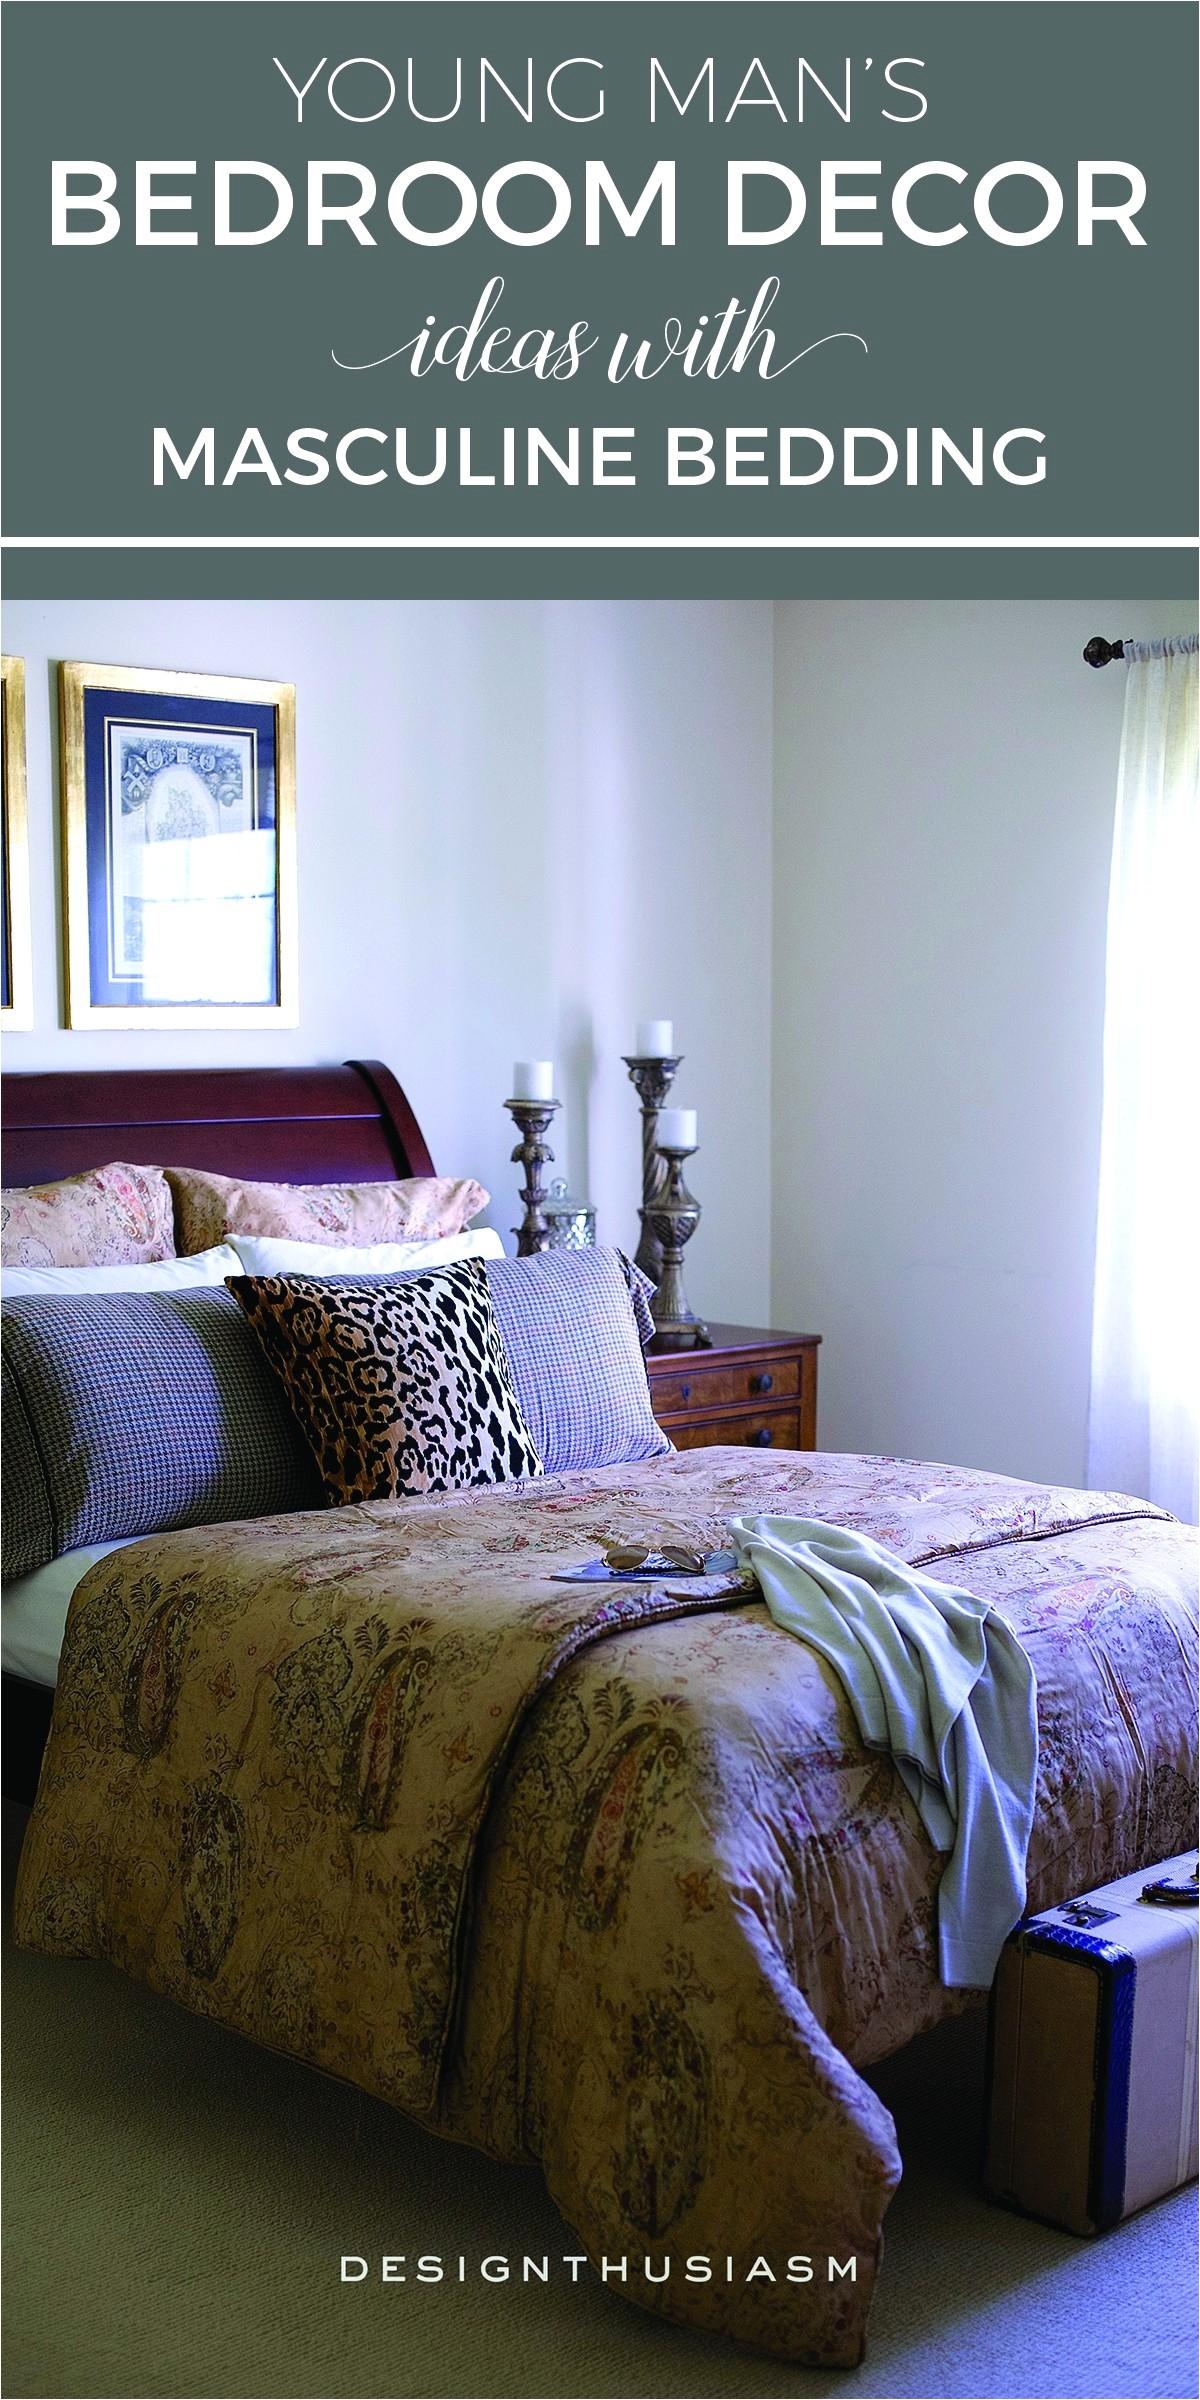 Best Blue for Bedroom Magnificent Kitchen Light Cover Best 1 Kirkland Wall Decor Home Design 0d